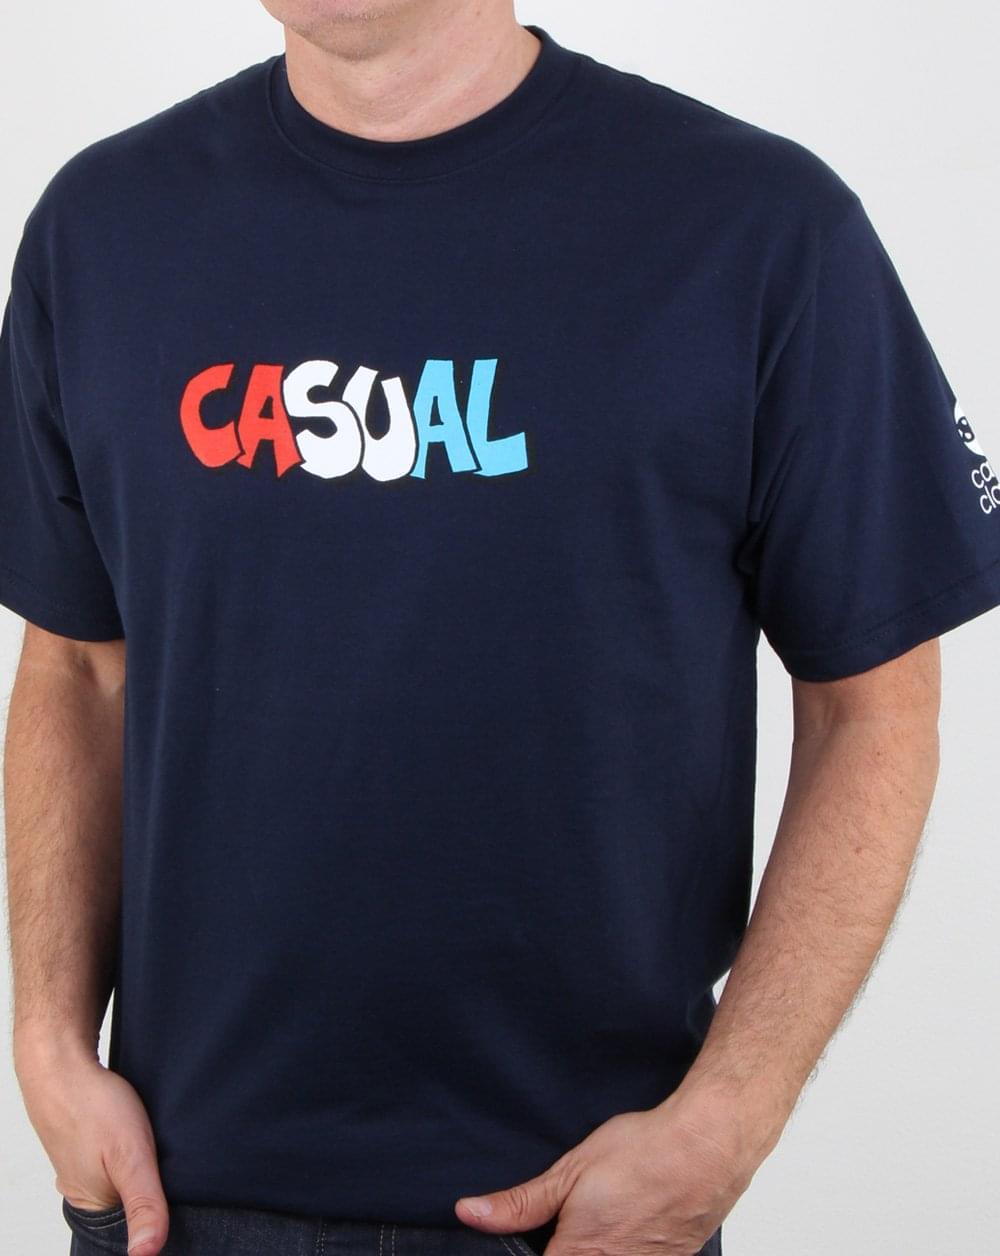 designer casual t-shirt casuals